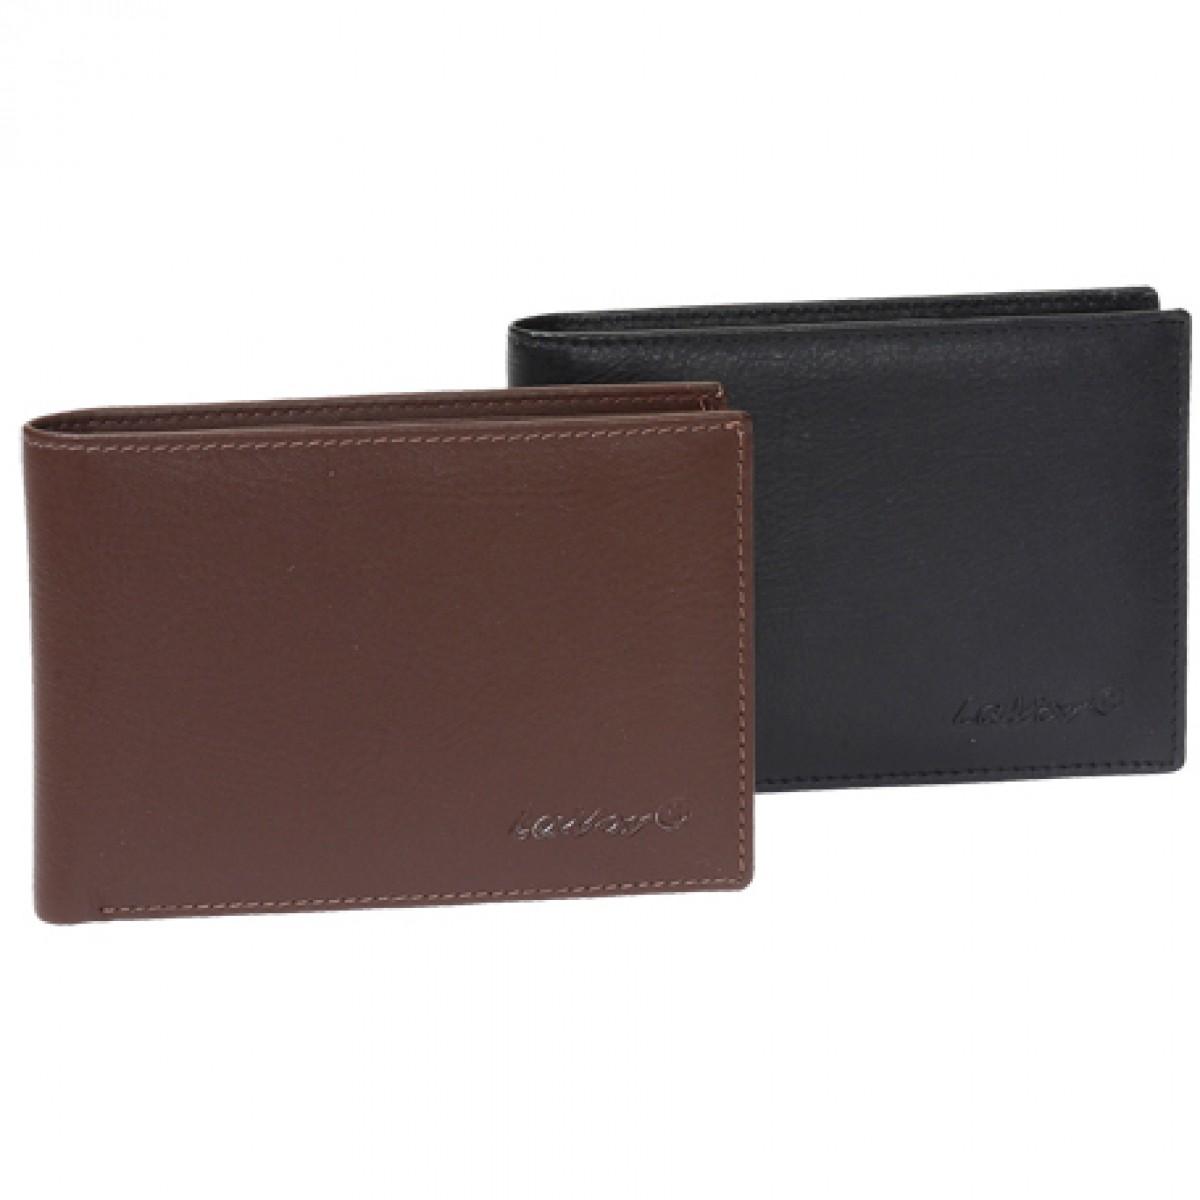 8f53f4acdb Δερμάτινο ανδρικό πορτοφόλι LAVOR 1-6558BLU ΜΠΛΕ ΧΡΩΜΑ με RFID ΠΡΟΣΤΑΣΙΑ  (Θήκη